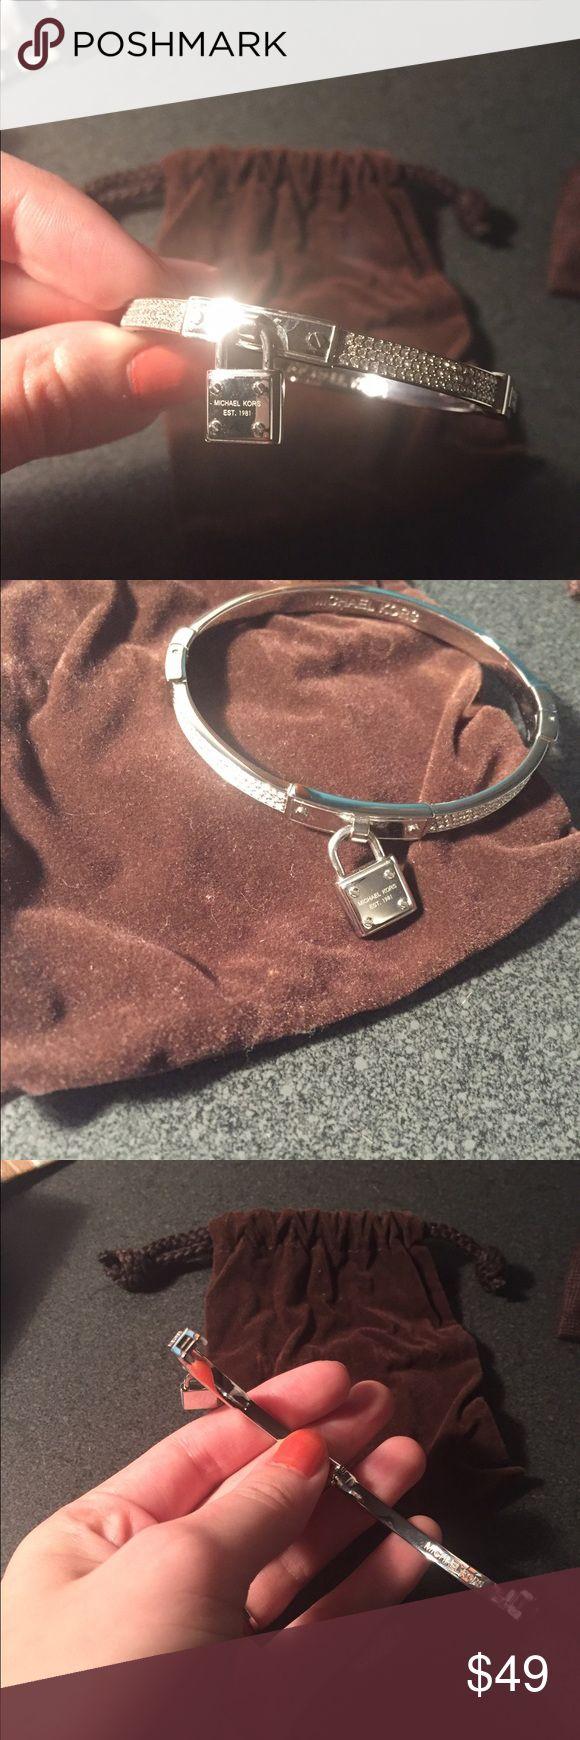 HP🎉 Michael Kors Silver Bracelet Like new.  Comes with dust bag.  No trades please. Michael Kors Jewelry Bracelets